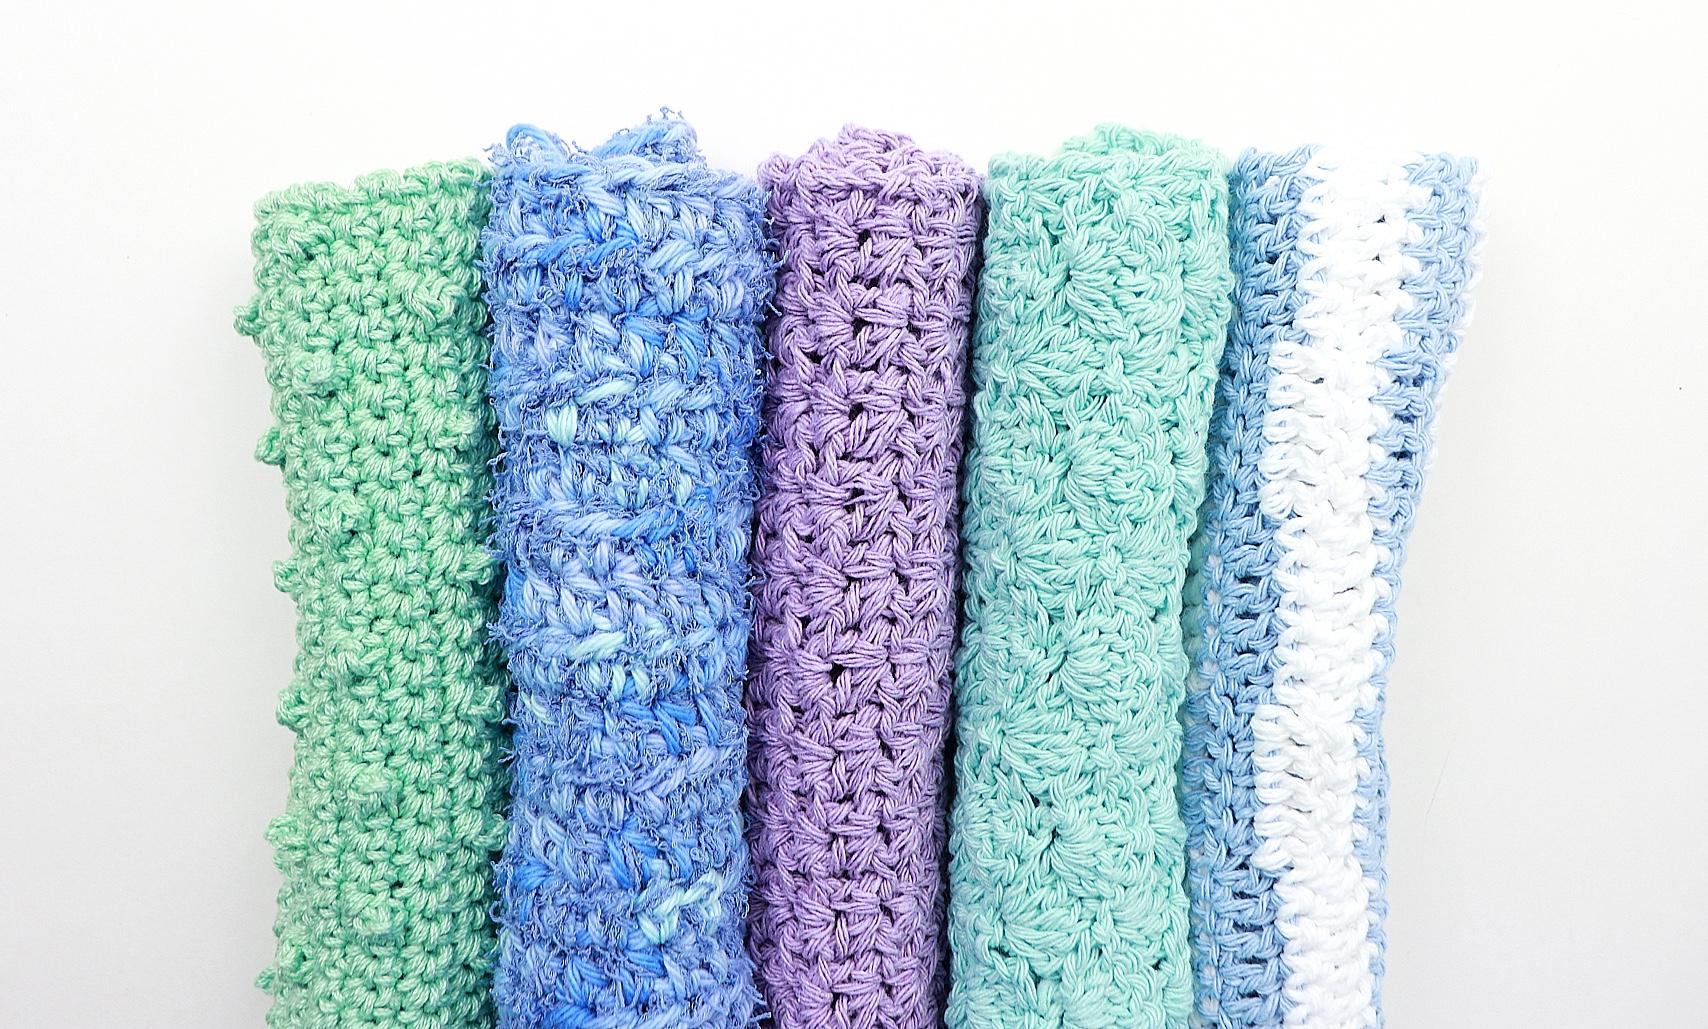 5 Quick & Pretty Crochet Washcloth Patterns to Practice the Basic Beginner Stitches